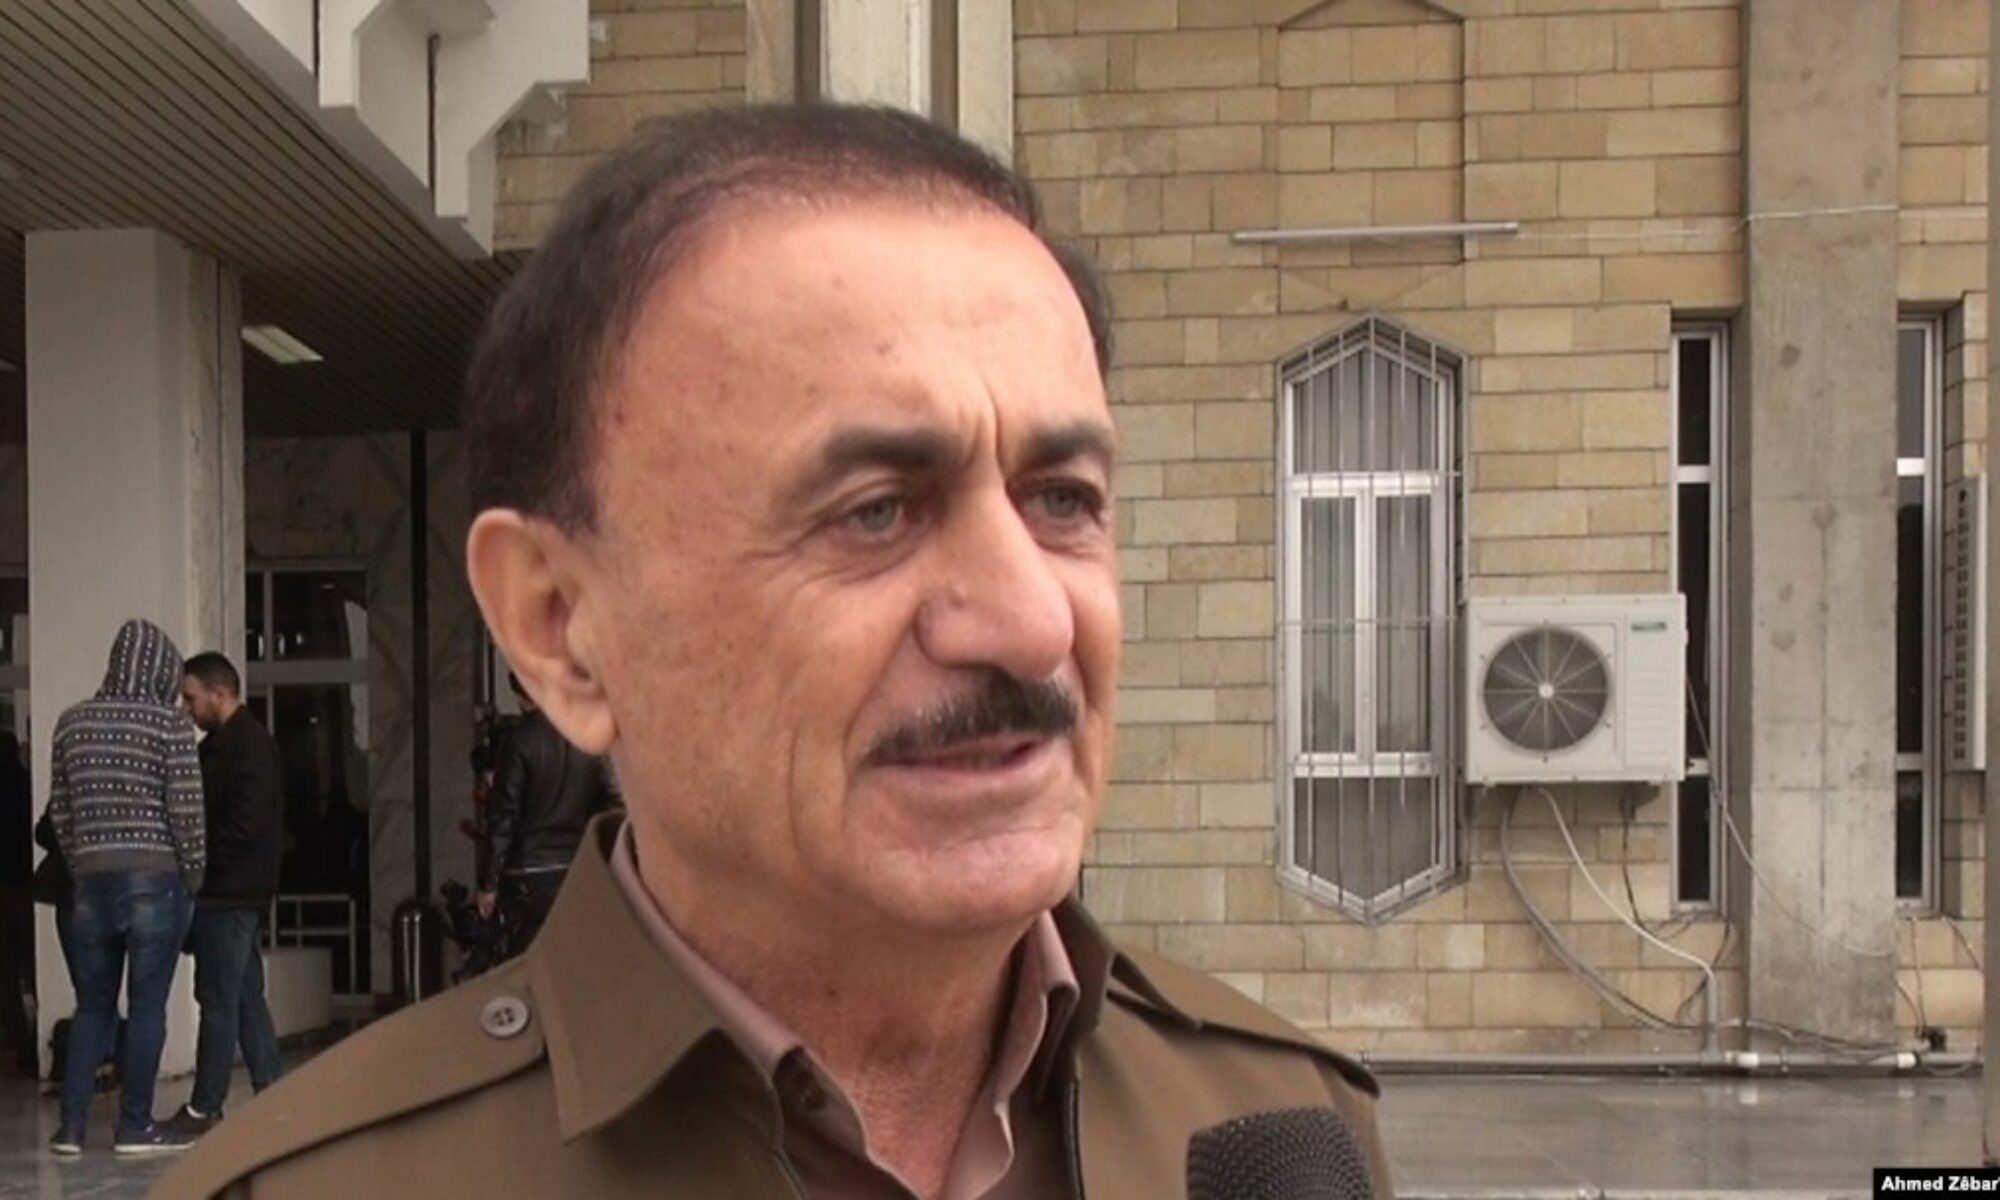 """İster PKK olsun ister Türk devleti bu işgalciliktir"""